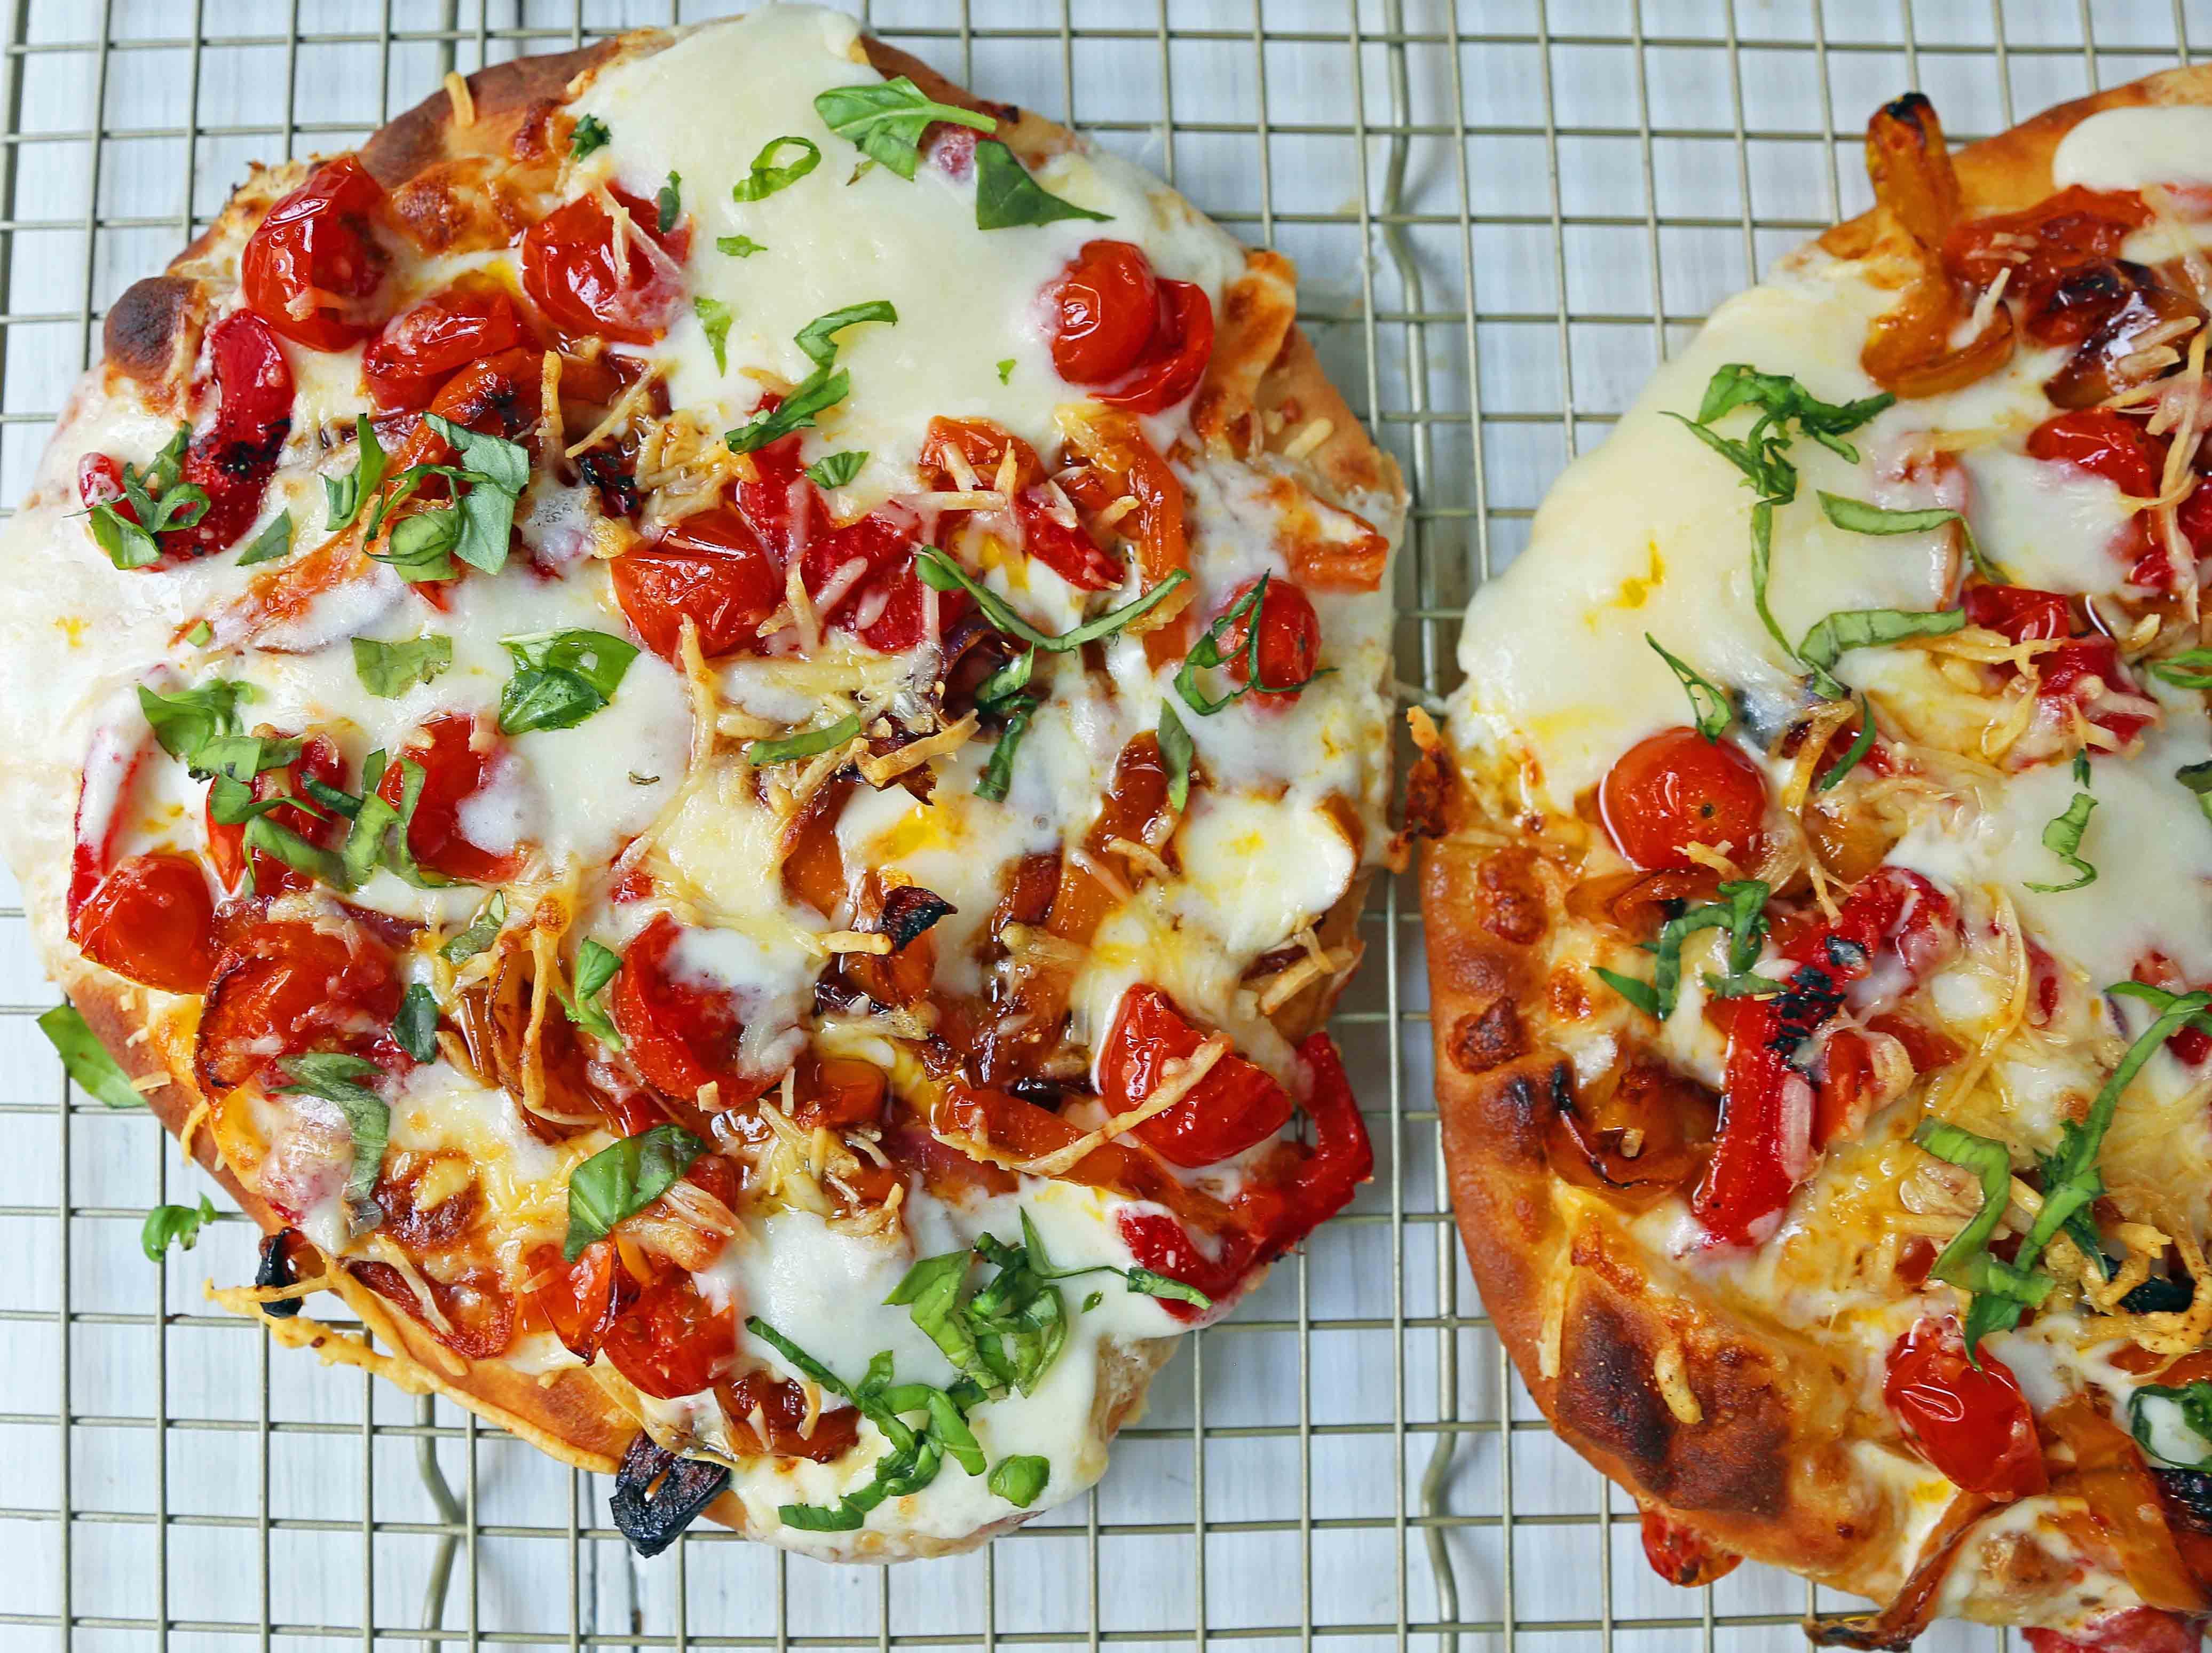 Veggie Pizza Recipe. Homemade veggie pizza with roasted vegetables, mozzarella cheese, and ricotta. Naan Bread Pizza made in 20 minutes! www.modernhoney.com #flatbreadpizza #naanbreadpizza